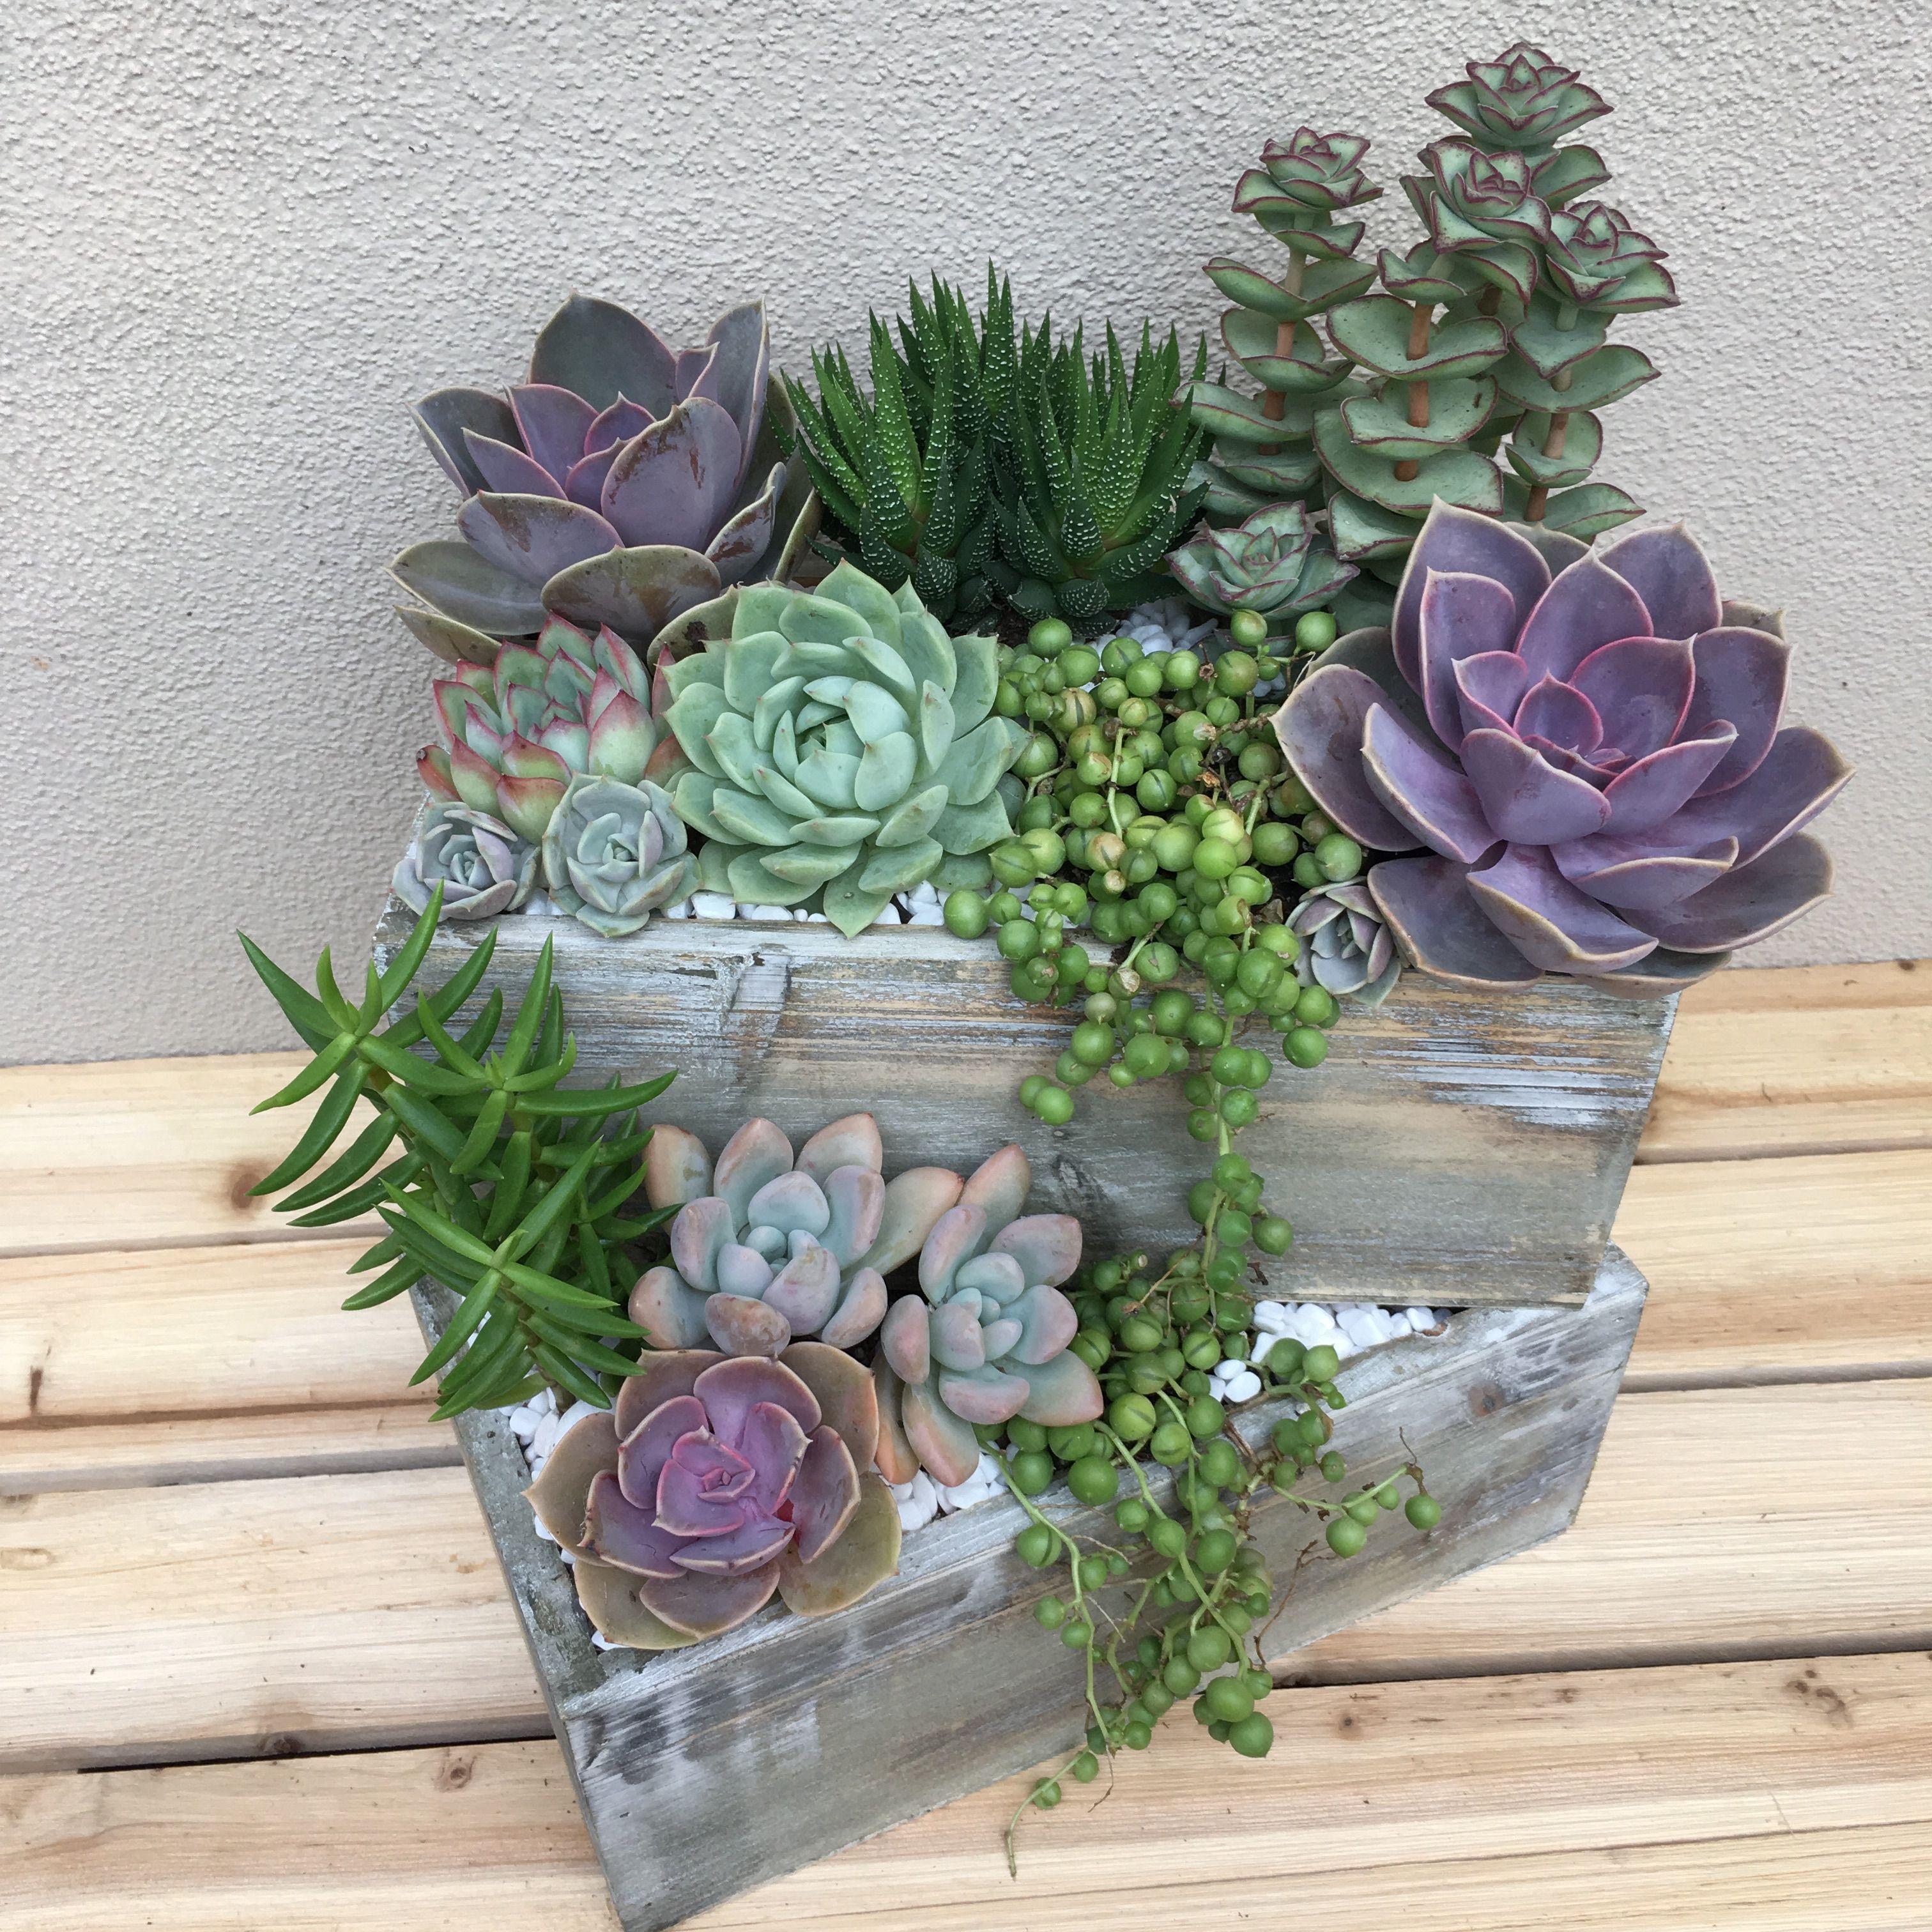 Custom Succulent Arrangement For A Customer Shipped As A Diy Kit